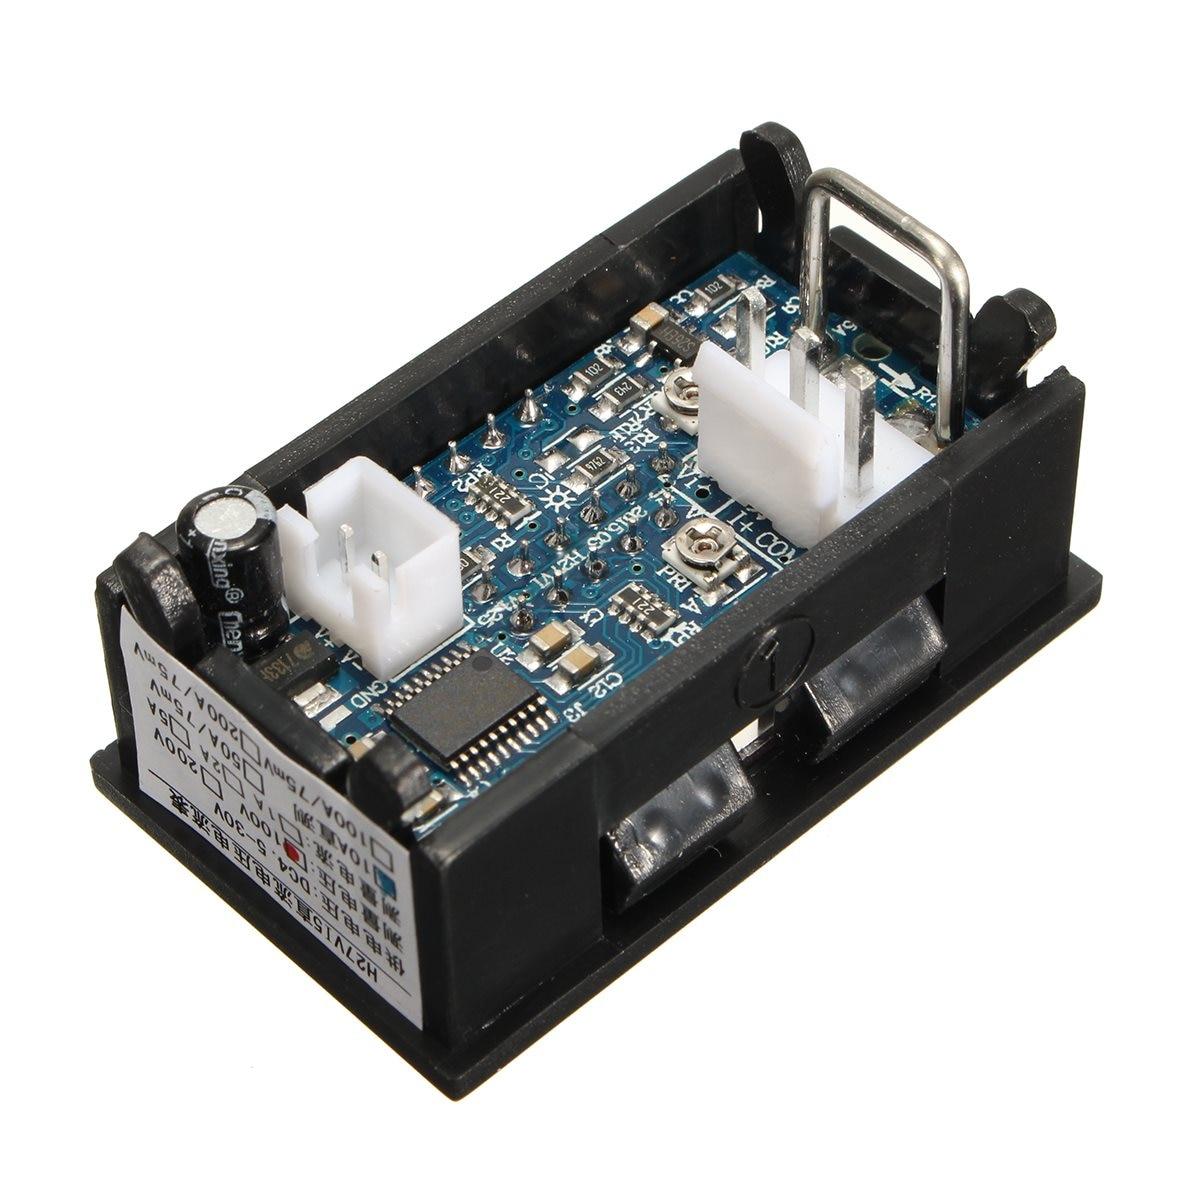 Buy Mini Digital Dc 100v 10a Voltmeter Ammeter Blue Wiring Diagram Red Led Panel Amp Dual Volt Meter Gauge Voltage Current Home Use Tool From